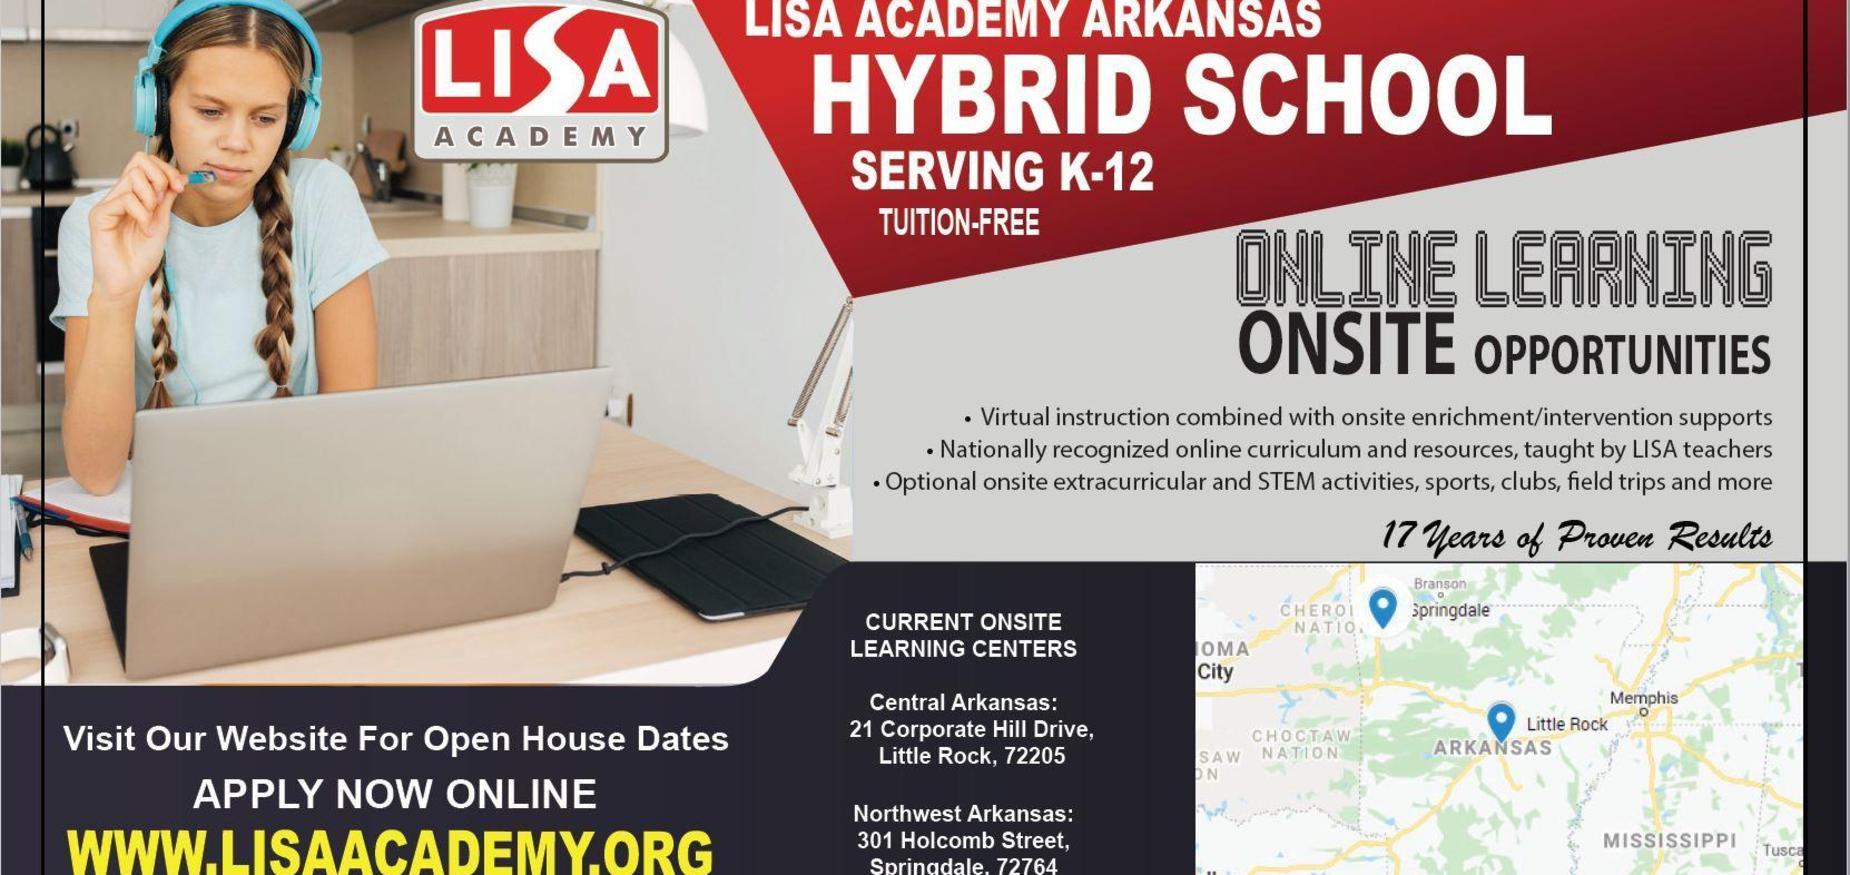 Hybrid school graphic